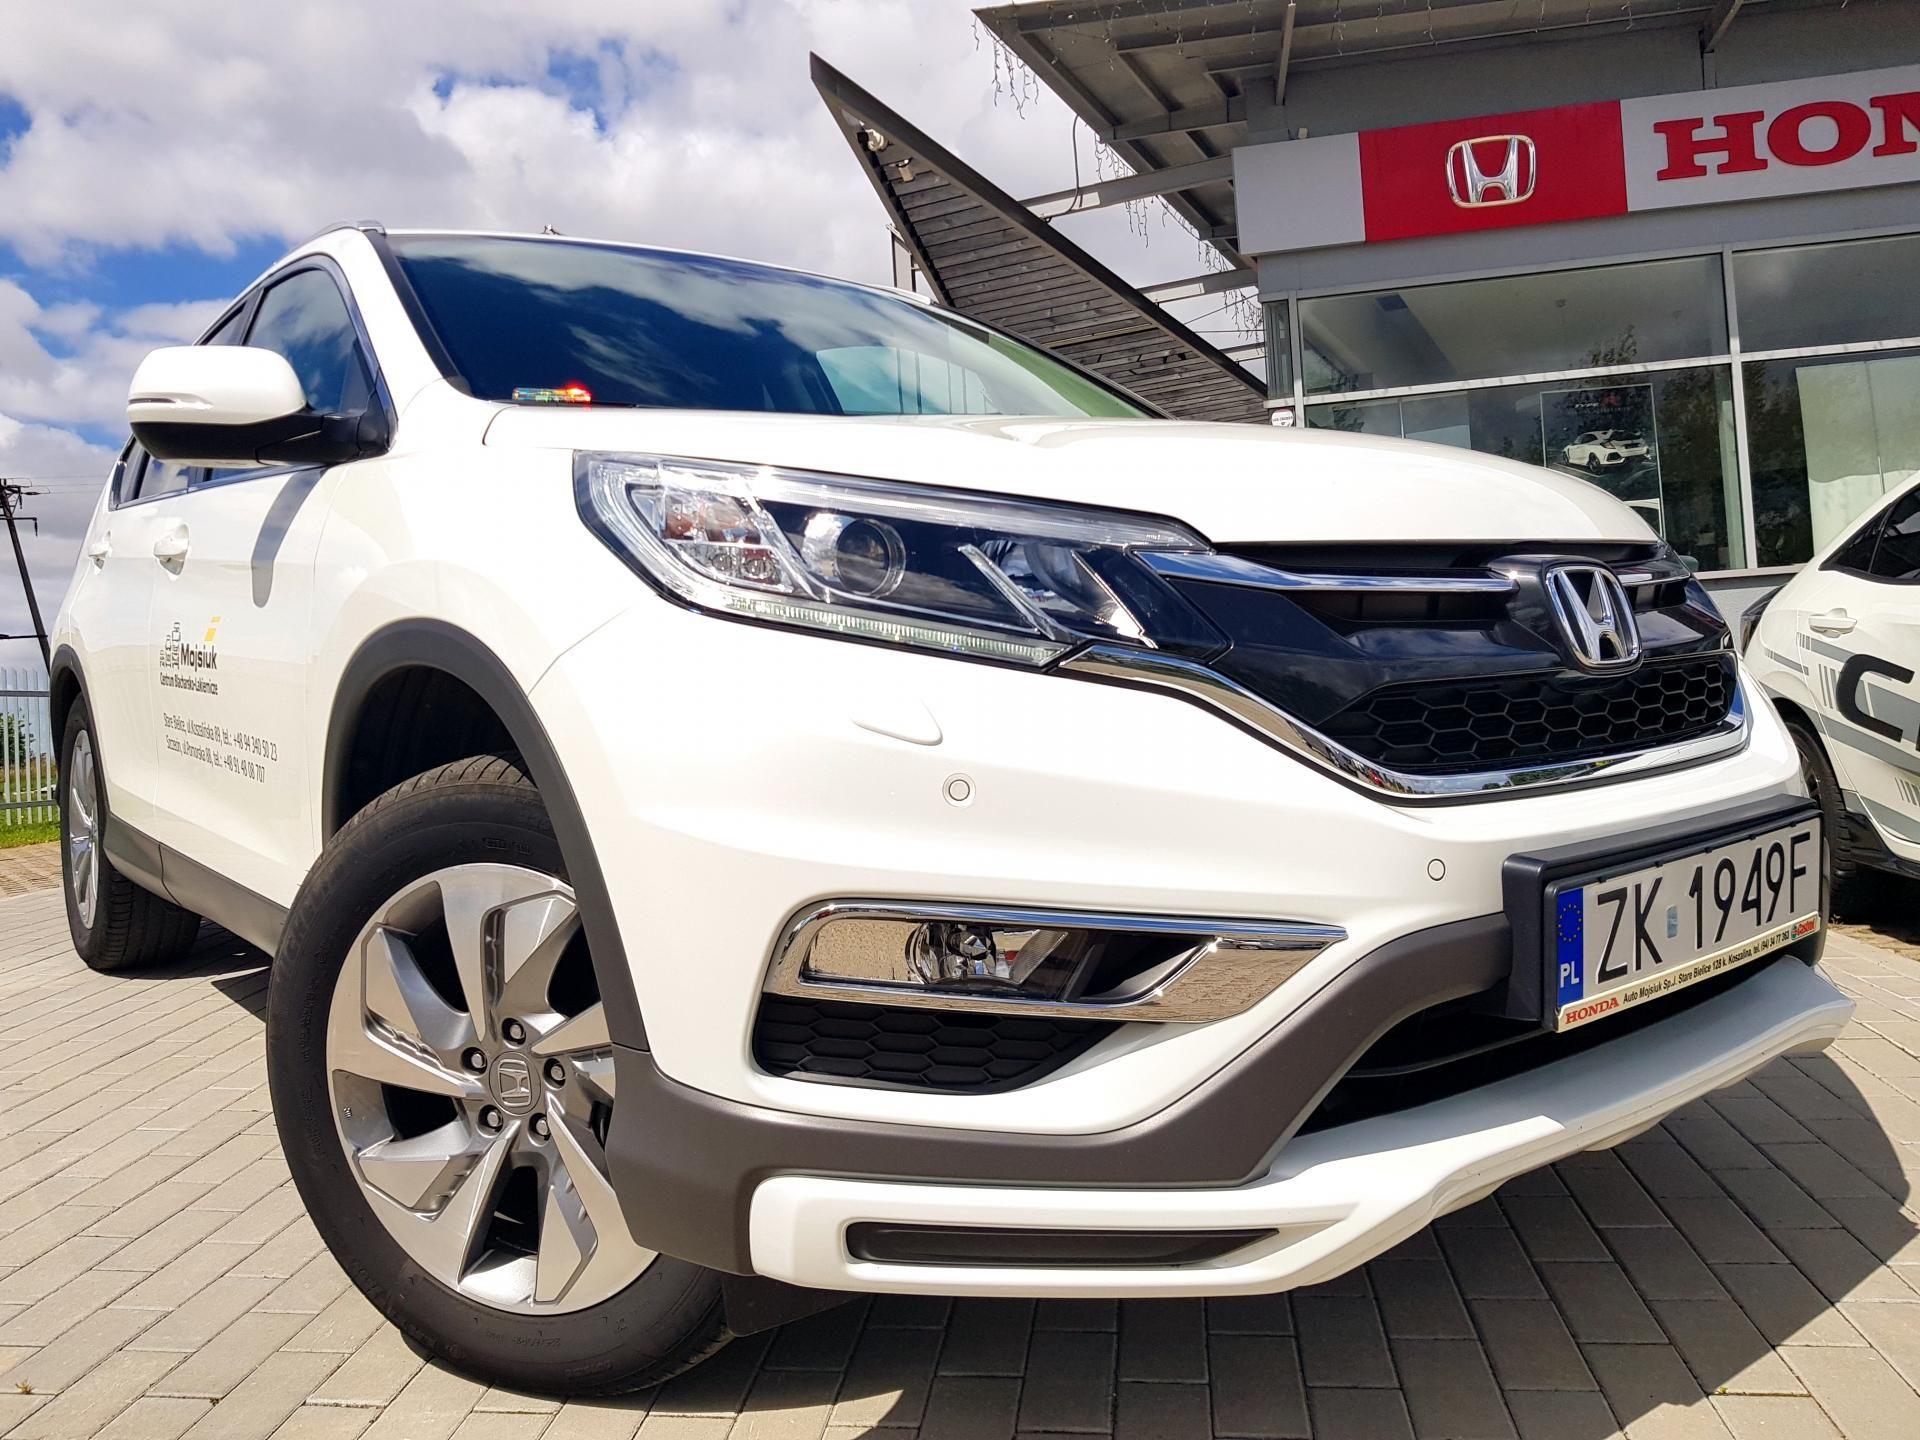 Honda CR-V 2.0 Lifestyle Plus AT 2018 Auto zastępcze Dealera, Na Gwarancji